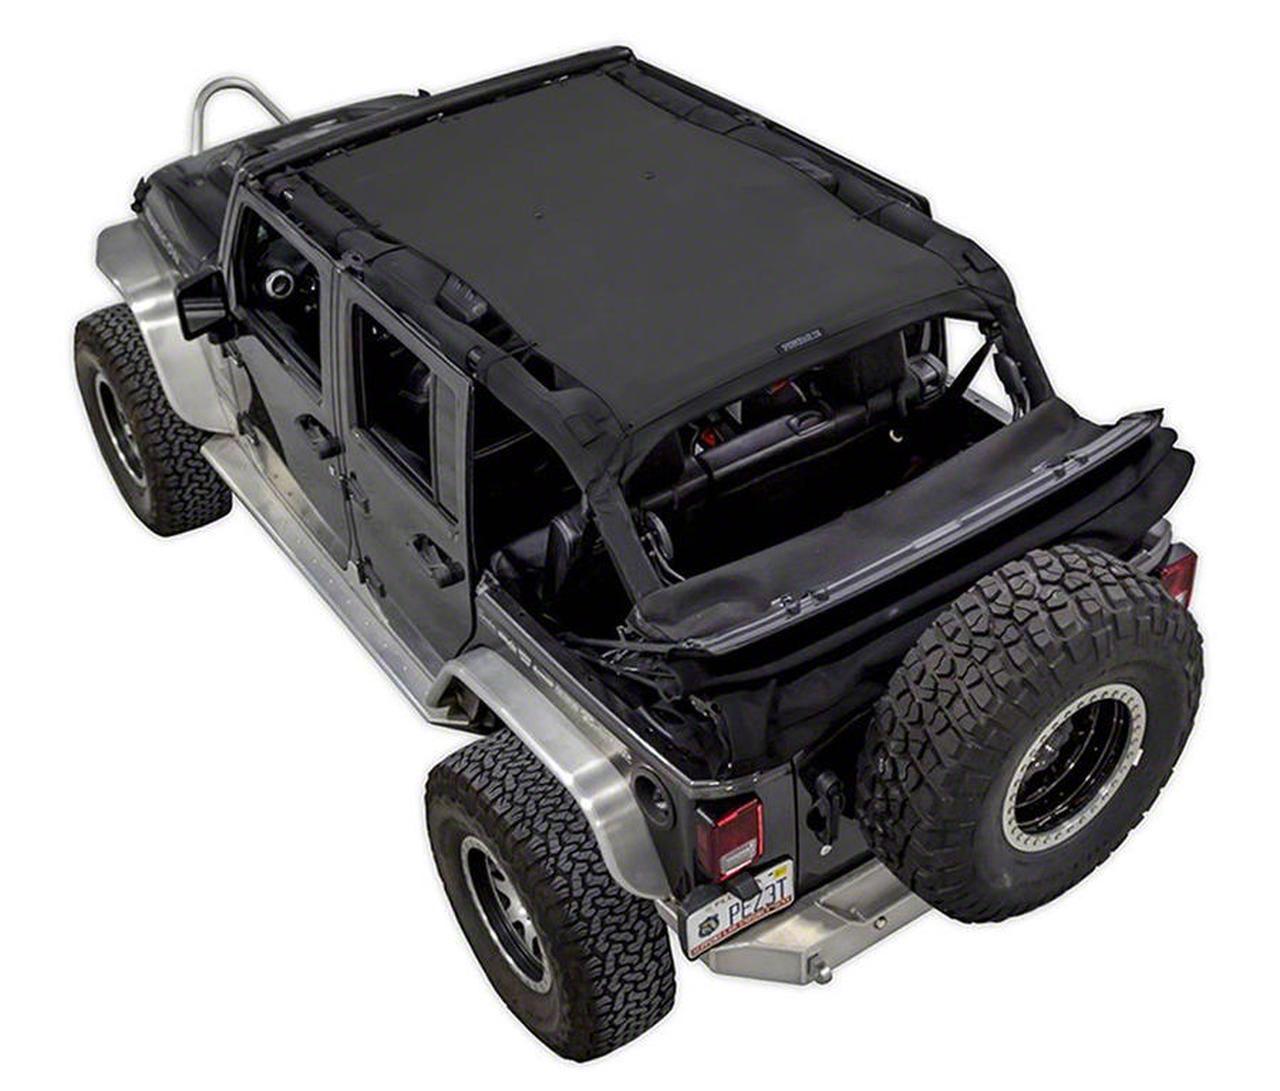 SpiderWeb Shade Trail Mesh ShadeTop - Black (07-18 Jeep Wrangler JK 4 Door)